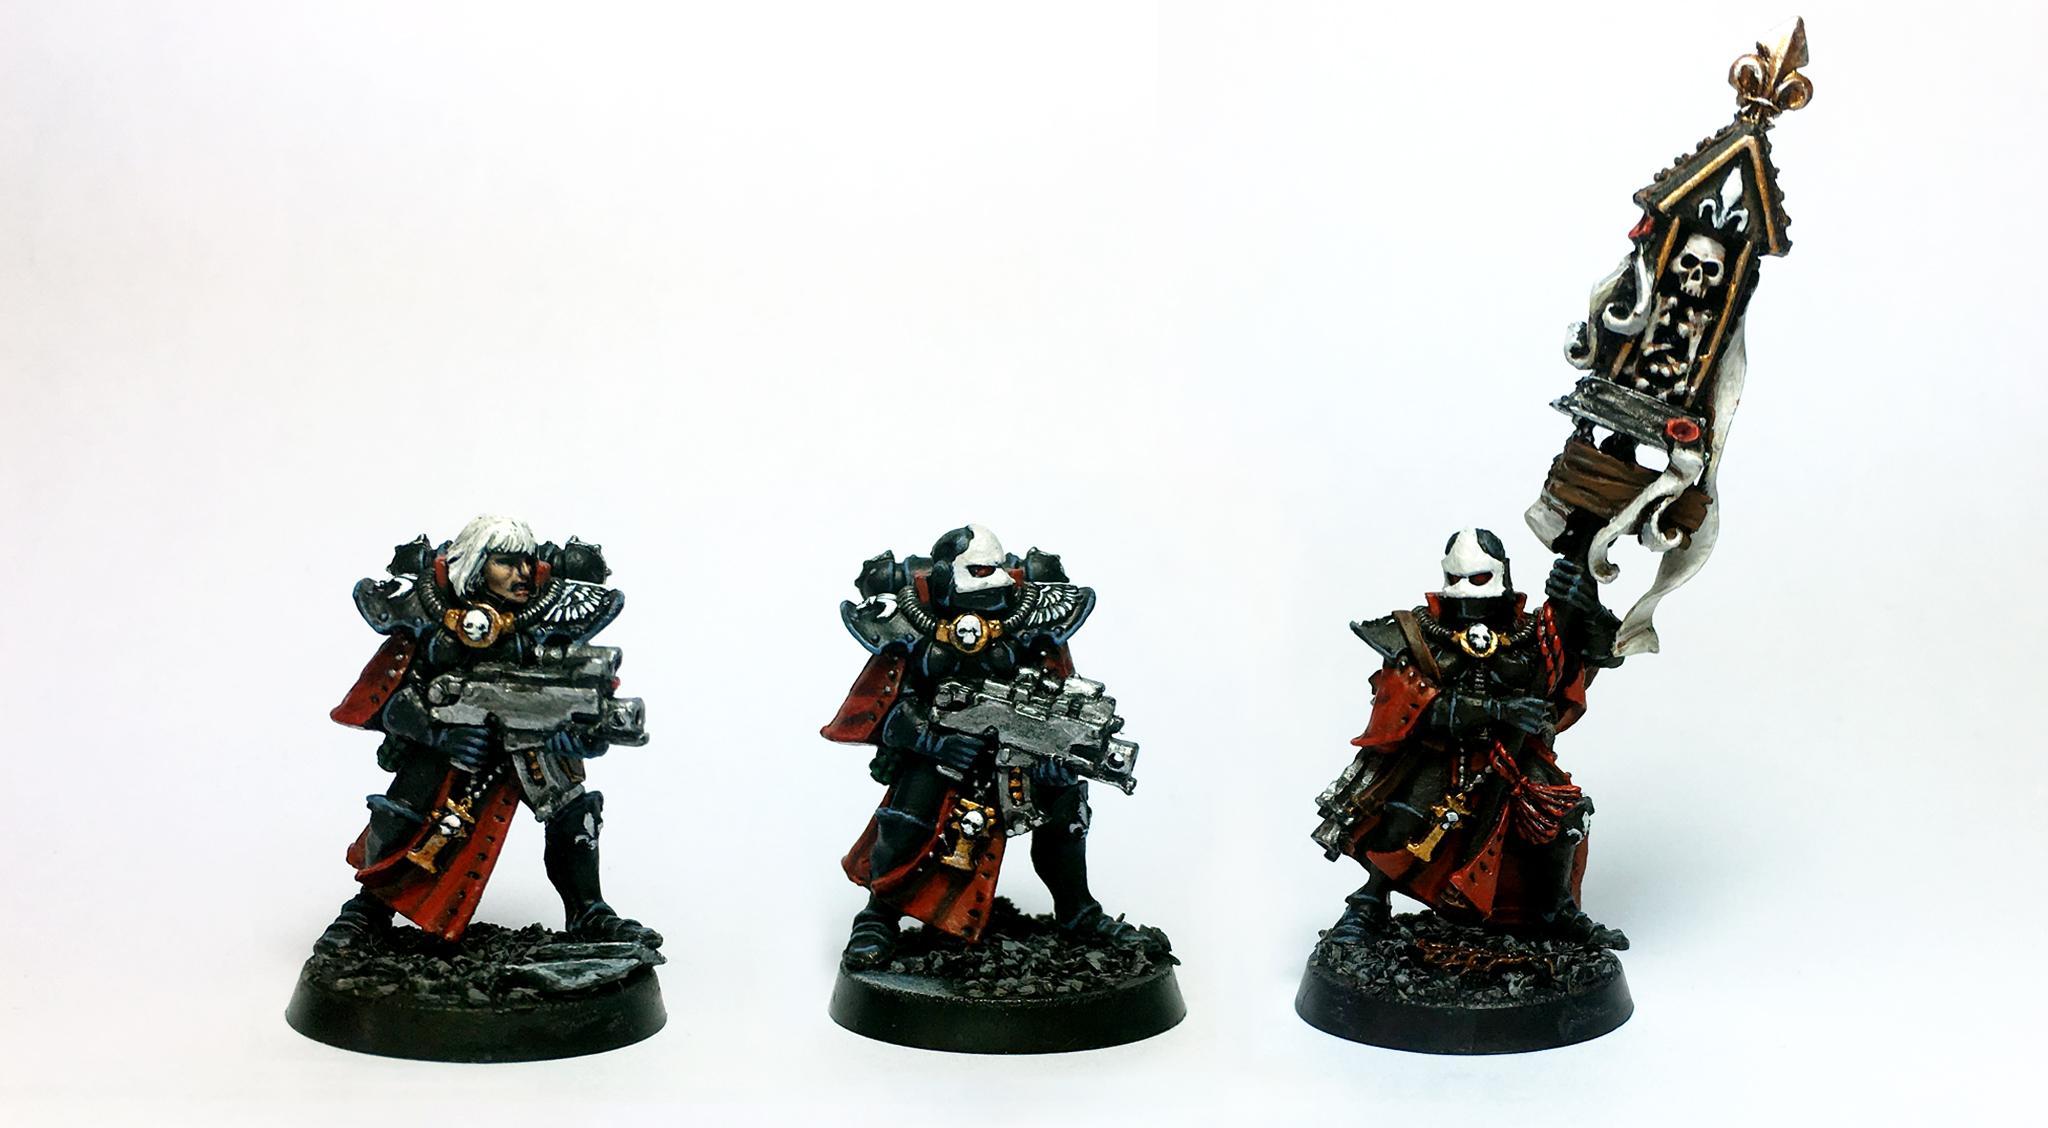 Adeptus Sororitas, Simulacrum Imperialis, Sisters Of Battle, Squad, Warhammer 40,000